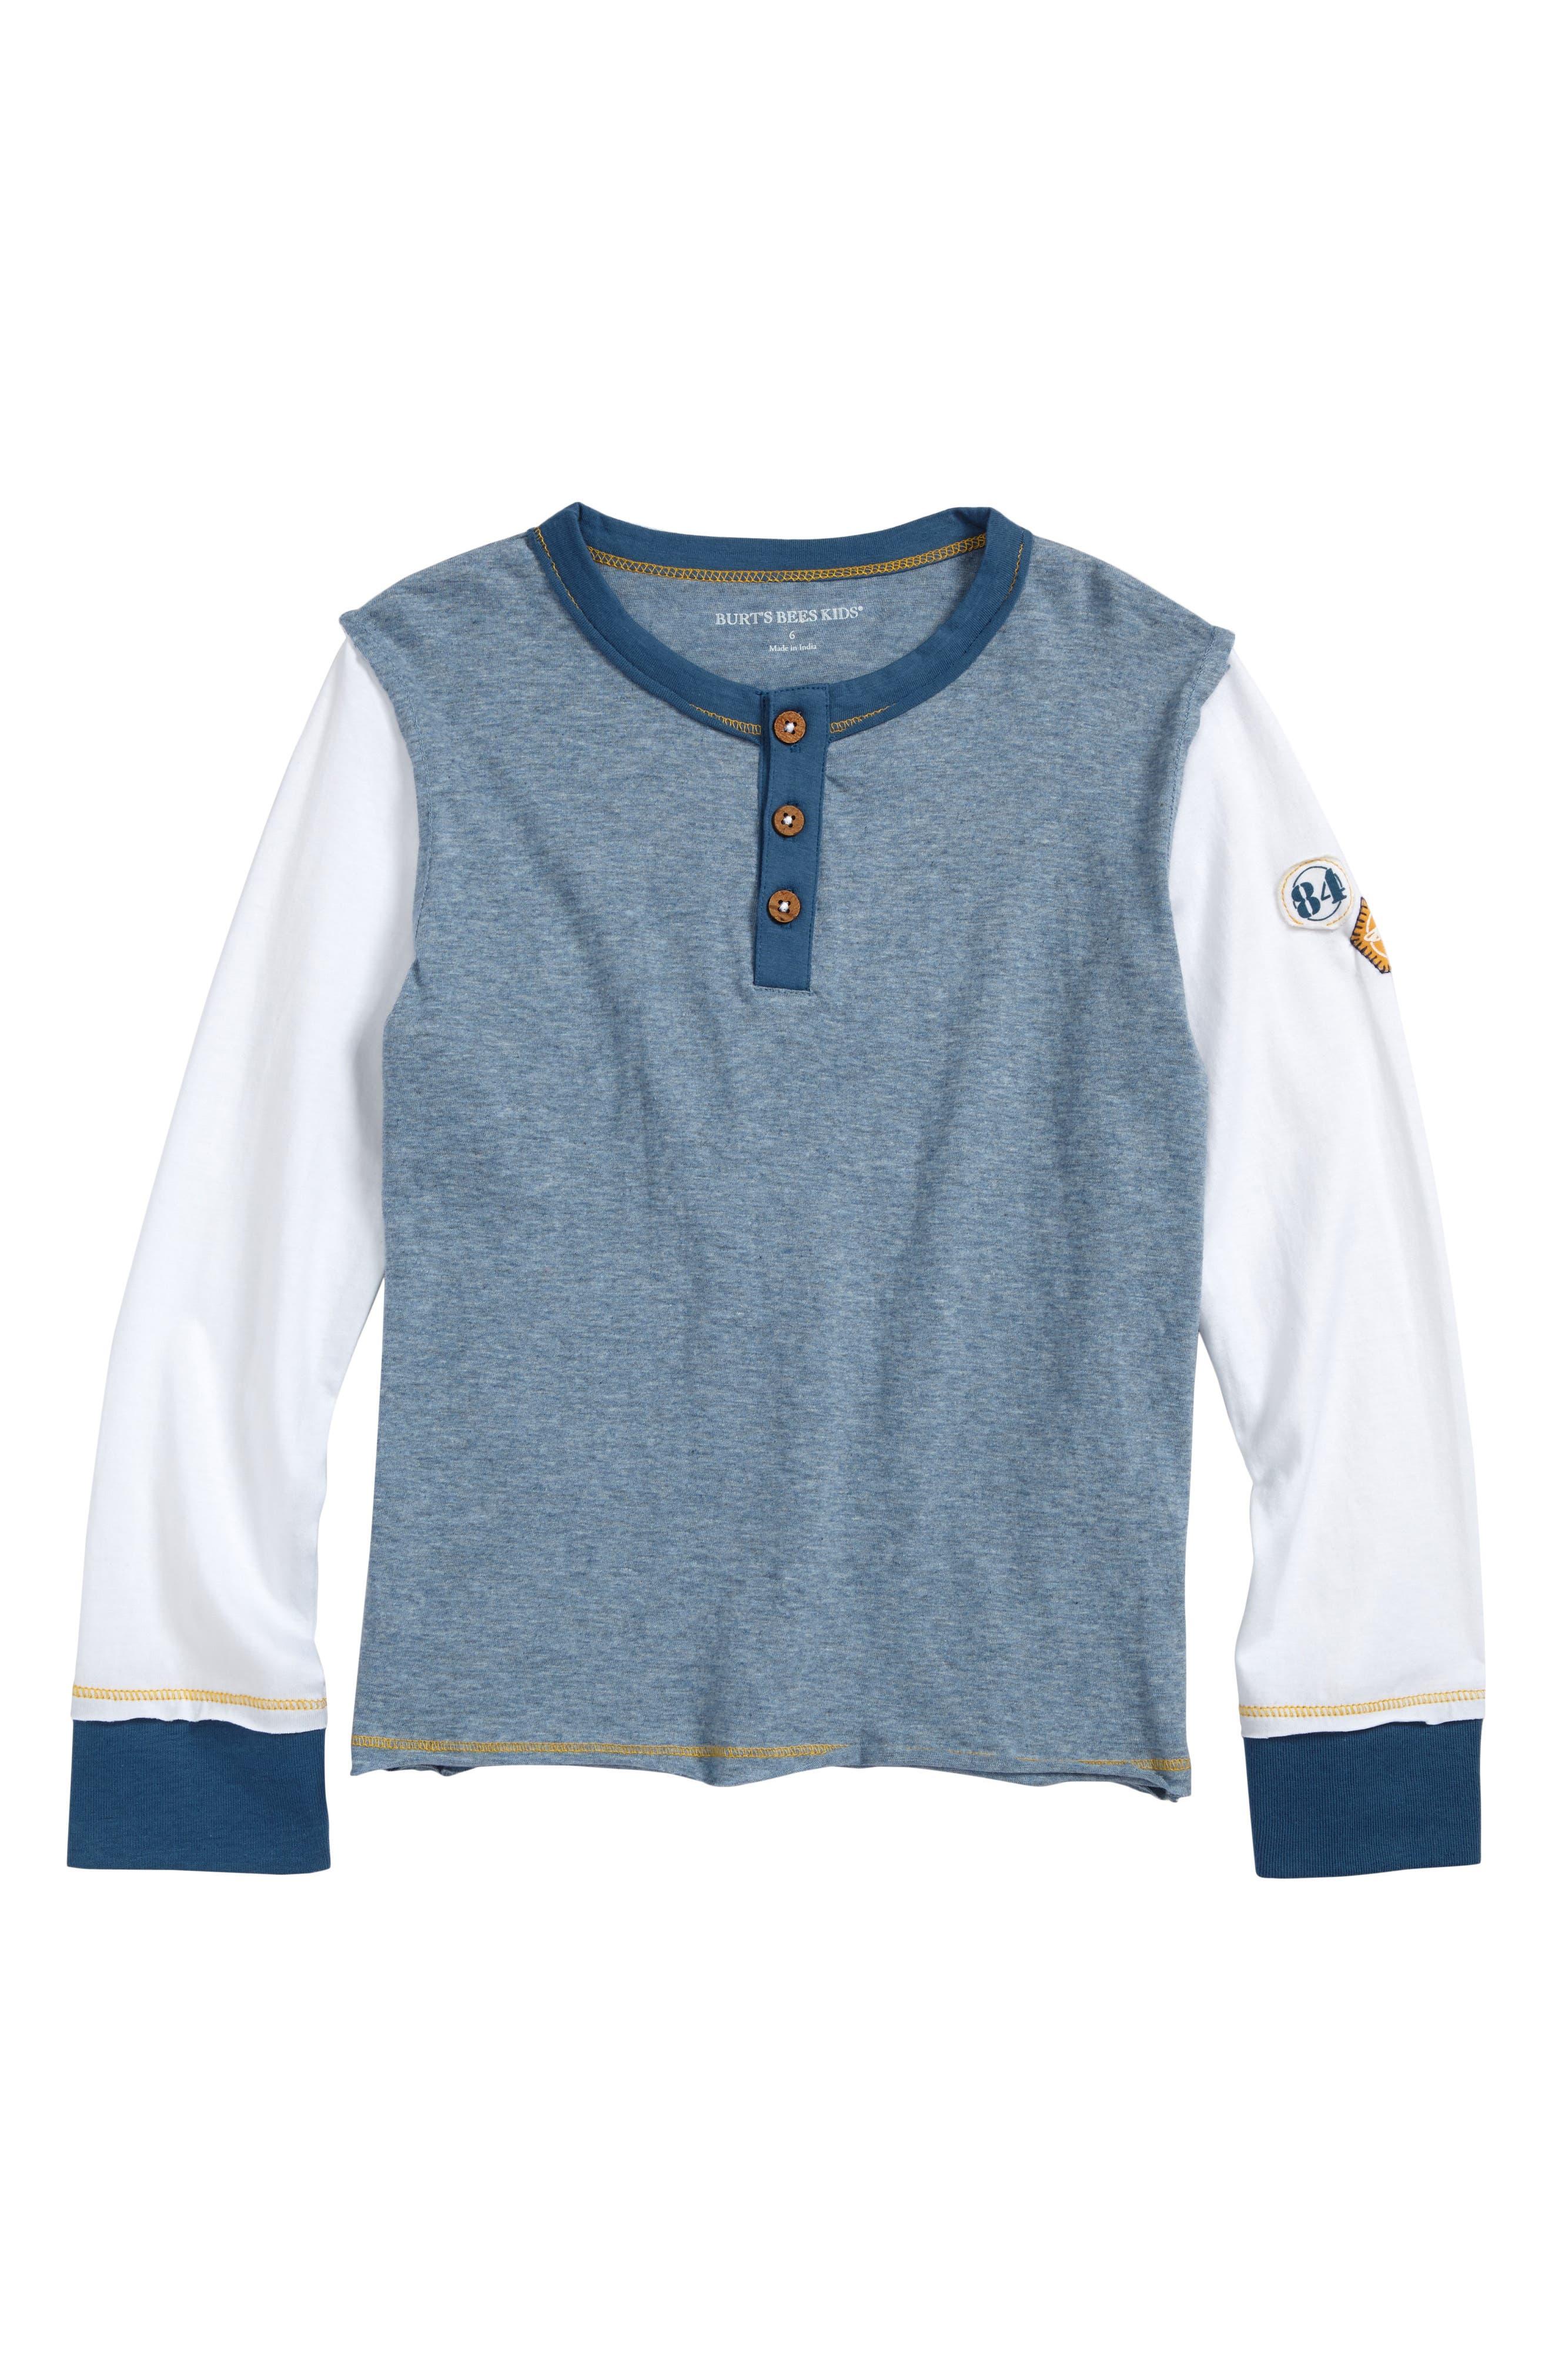 Alternate Image 1 Selected - Burt's Bees Baby Organic Cotton Henley T-Shirt (Toddler Boys & Little Boys)